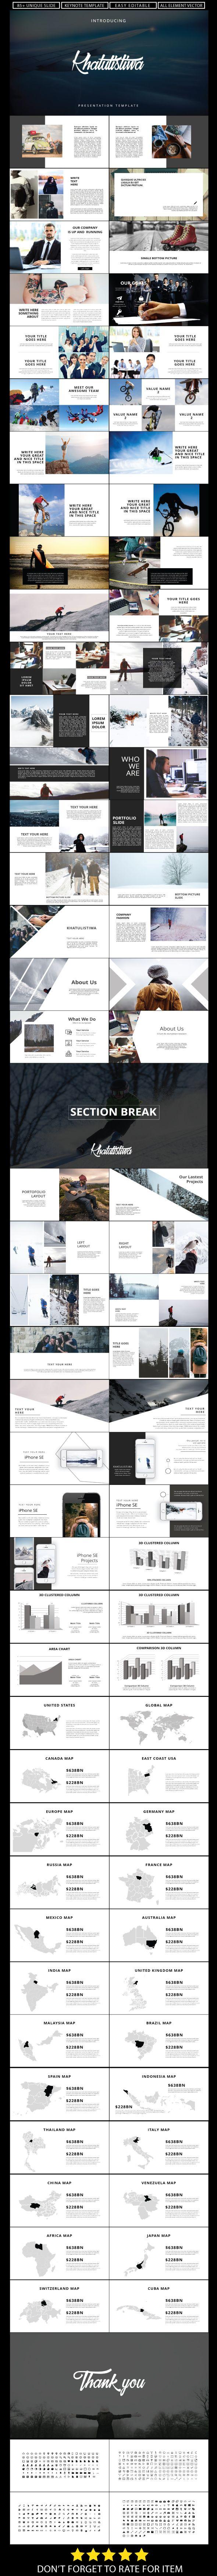 Poster design templates powerpoint - Khatulistiwa Keynote Presentation Template Business Corporate Creative Ecommerce